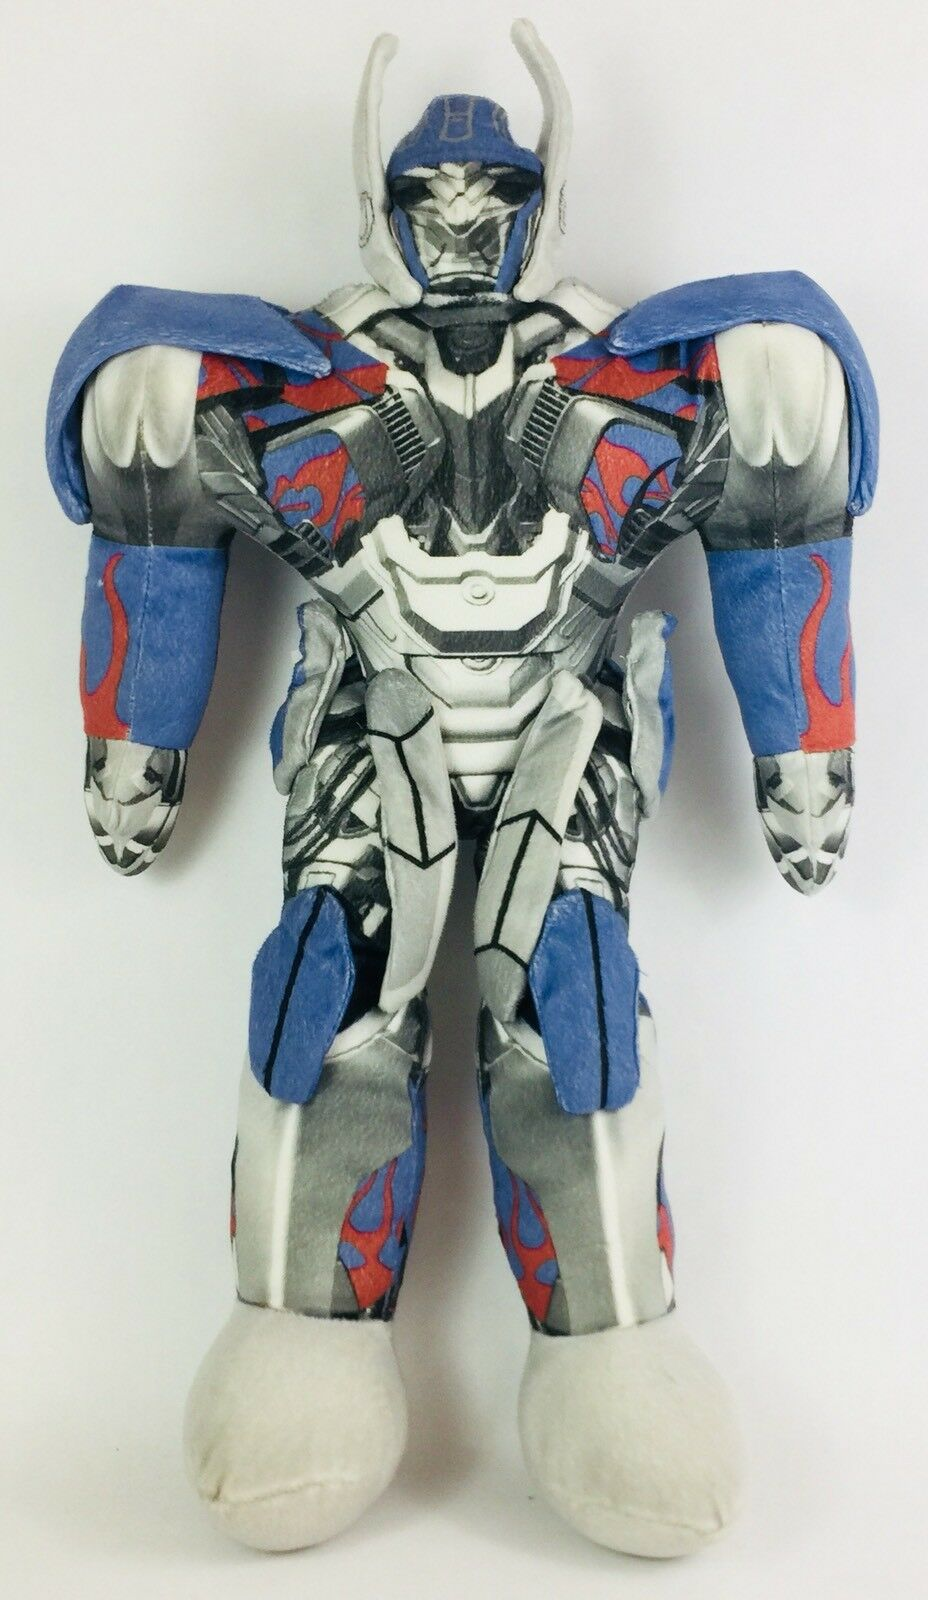 RARE     Transformers 4 Brave Comrade Commando Hasbro Decorative Pillow